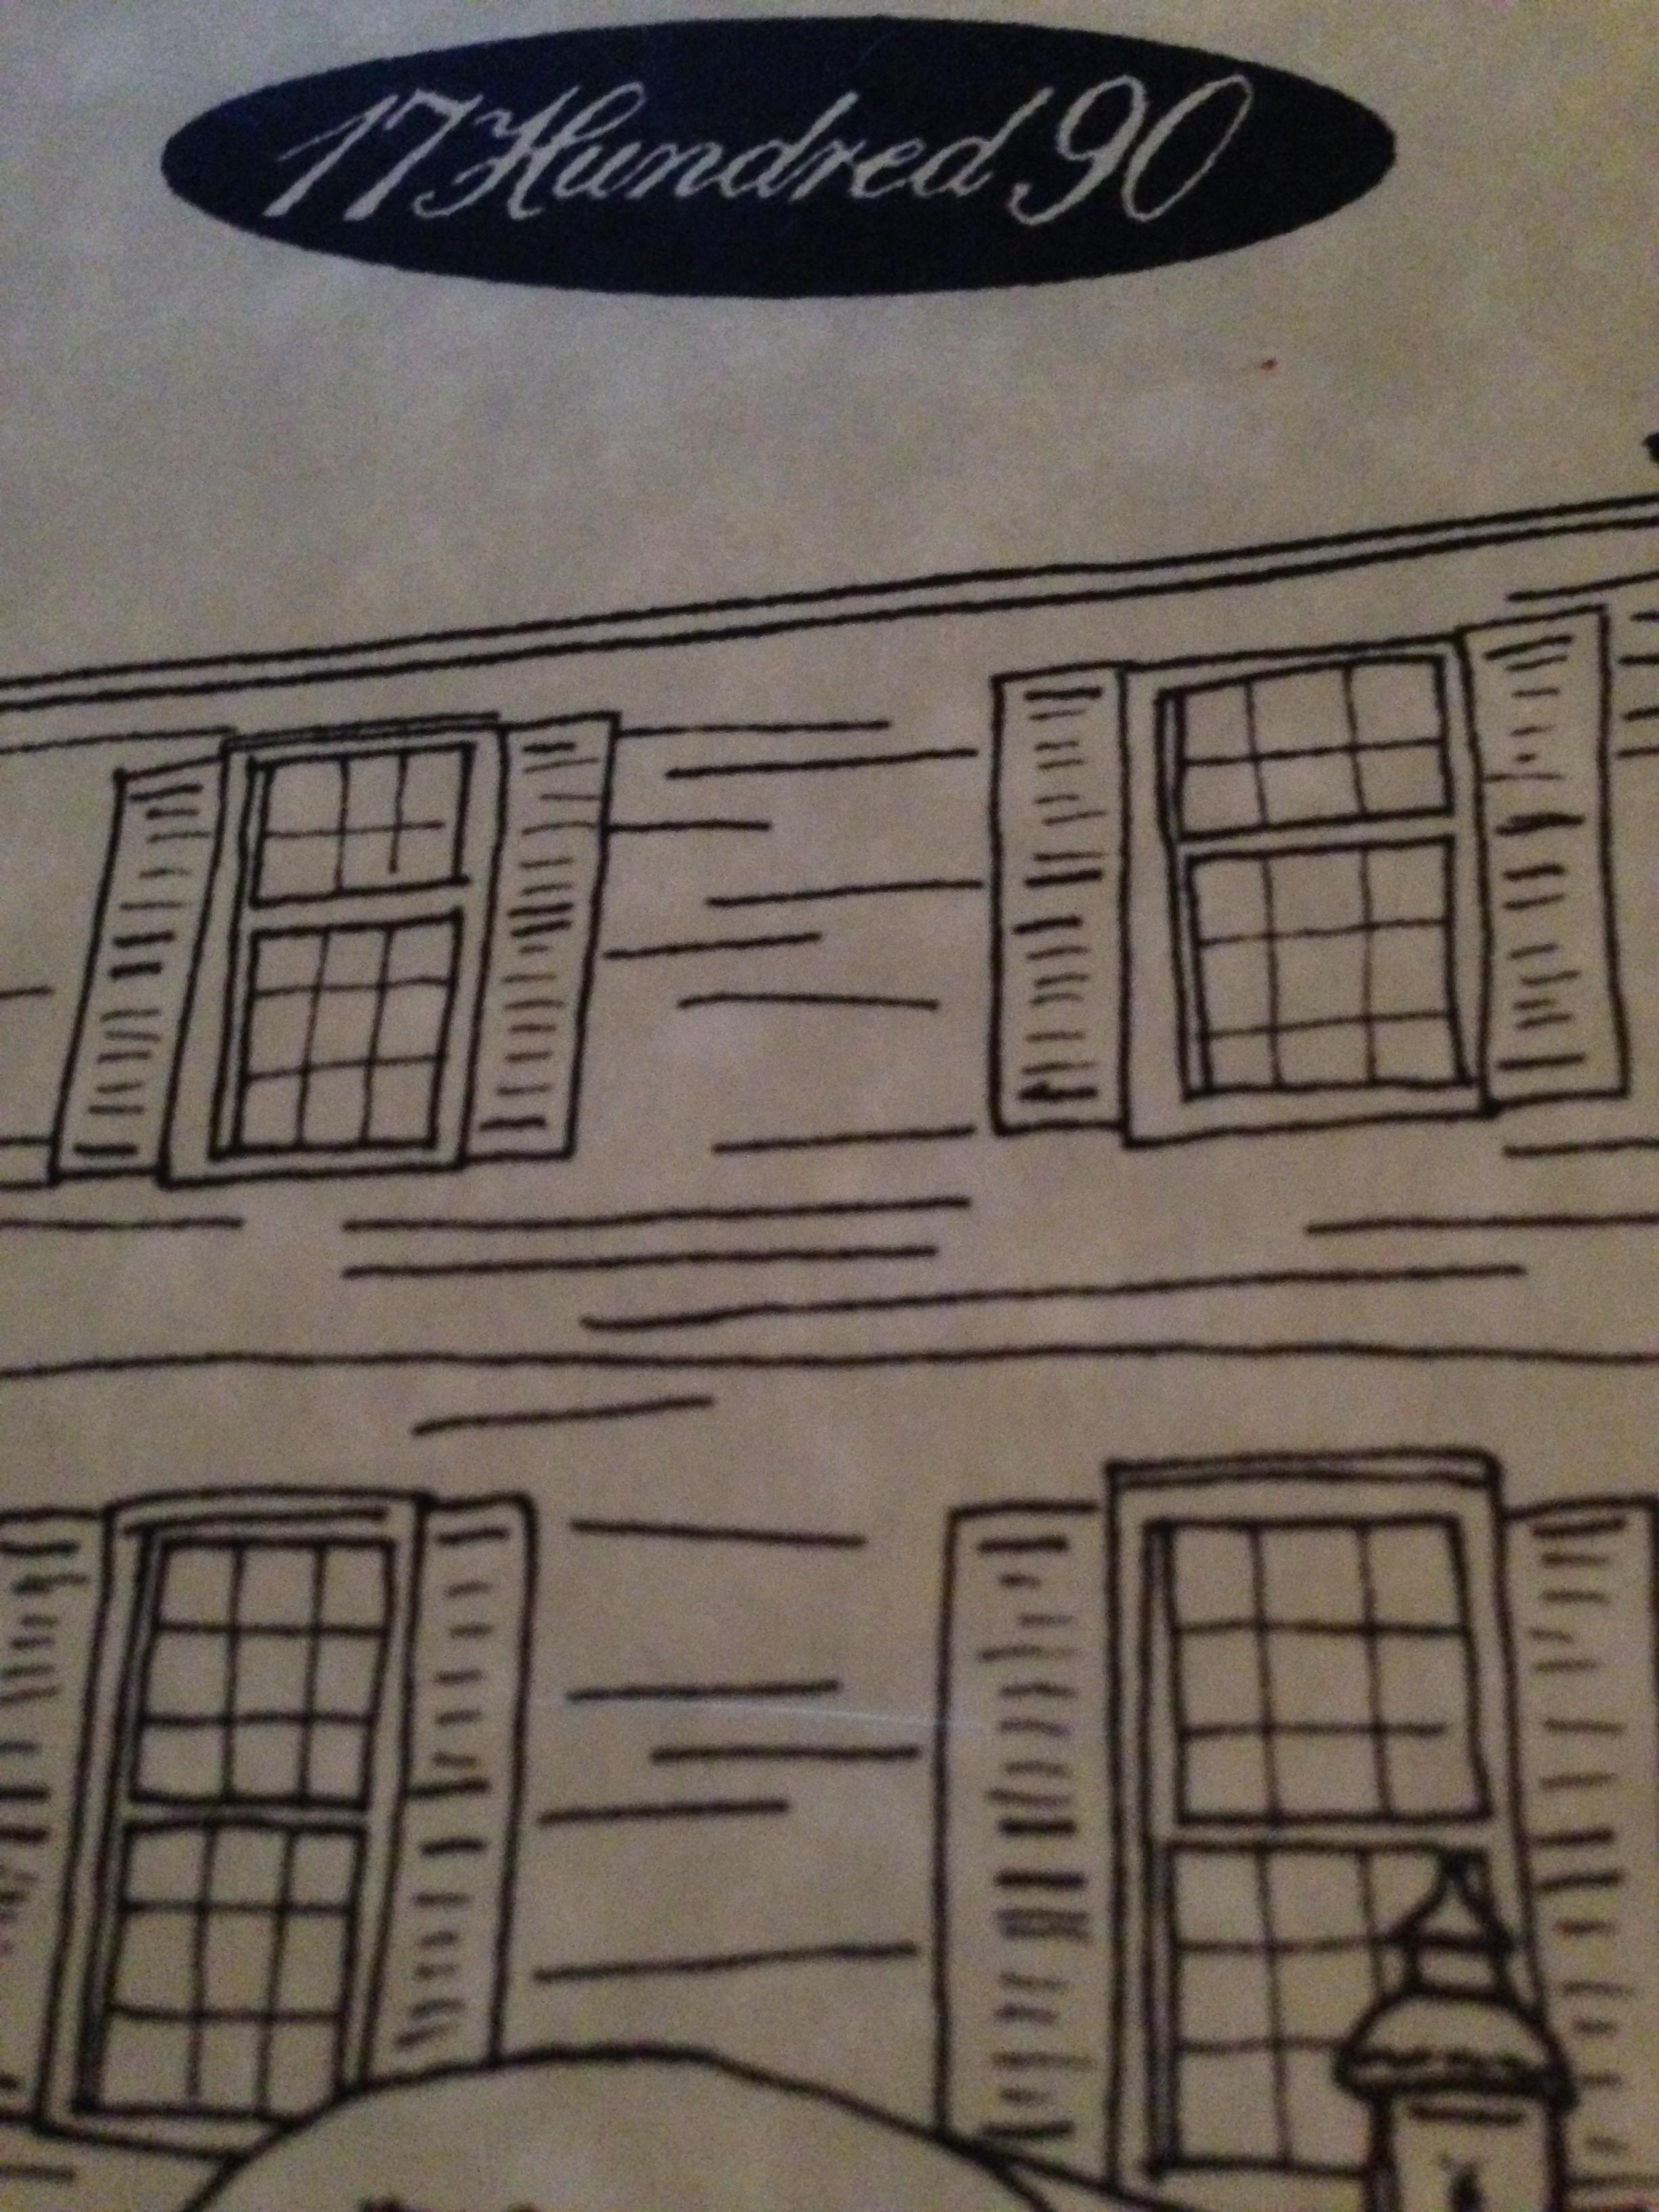 17Hundred90 Inn Restaurant – Savannah